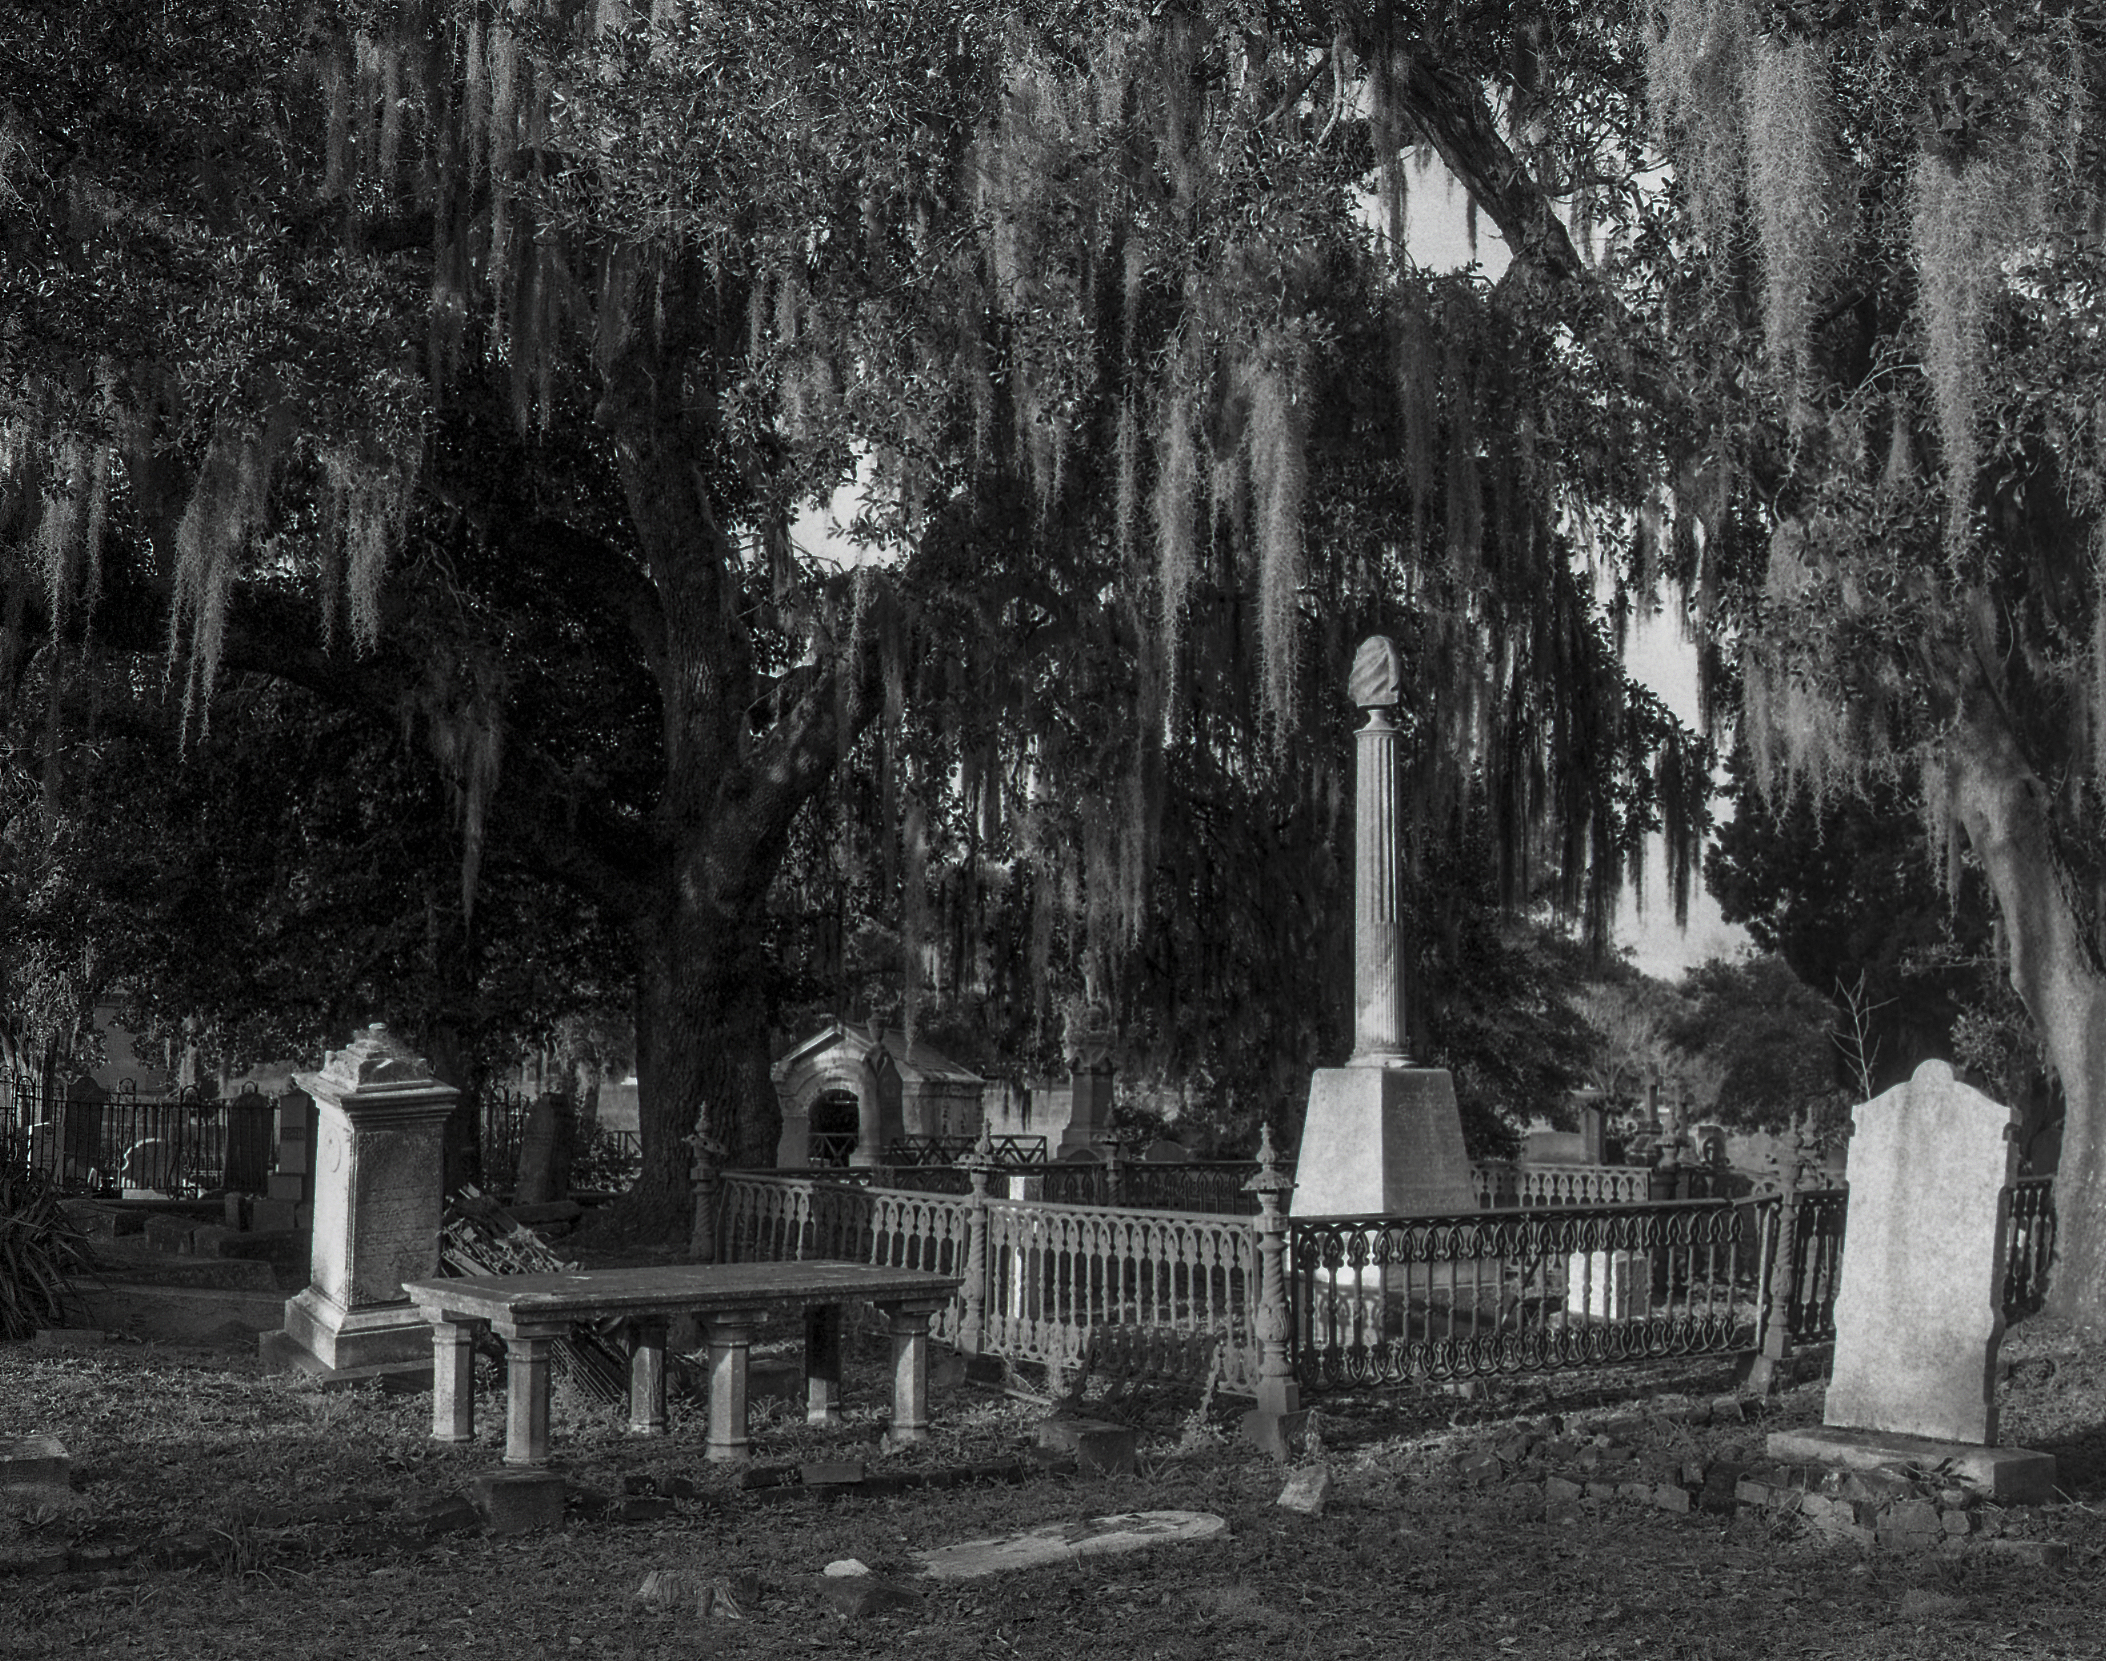 cemetery_bw_scans018.jpg